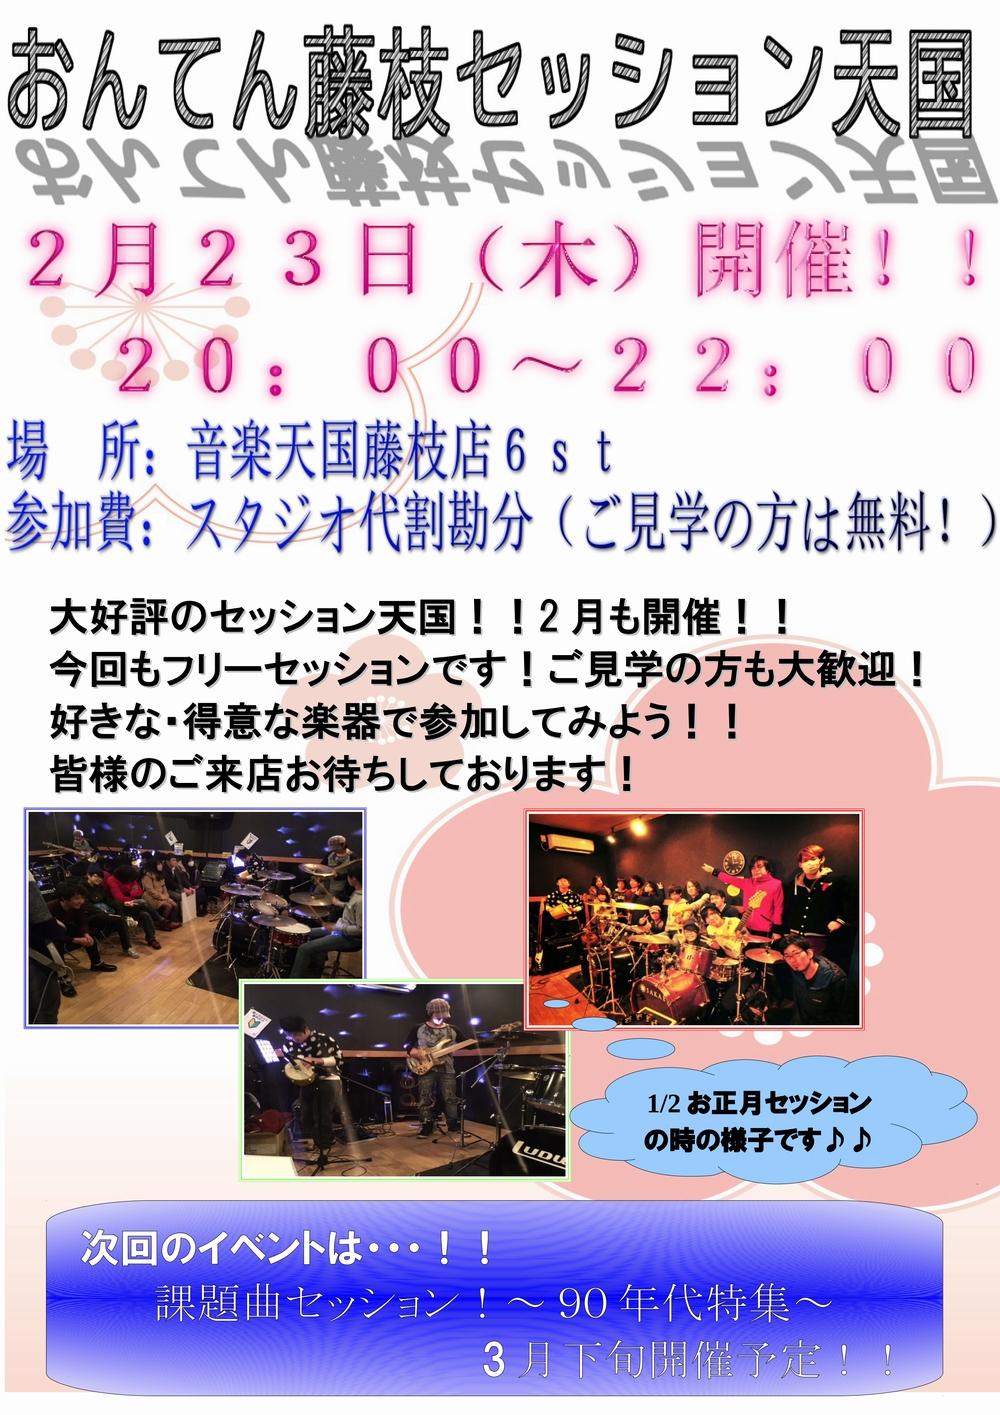 【セッション天国】音楽天国・藤枝店2月23日(木)開催